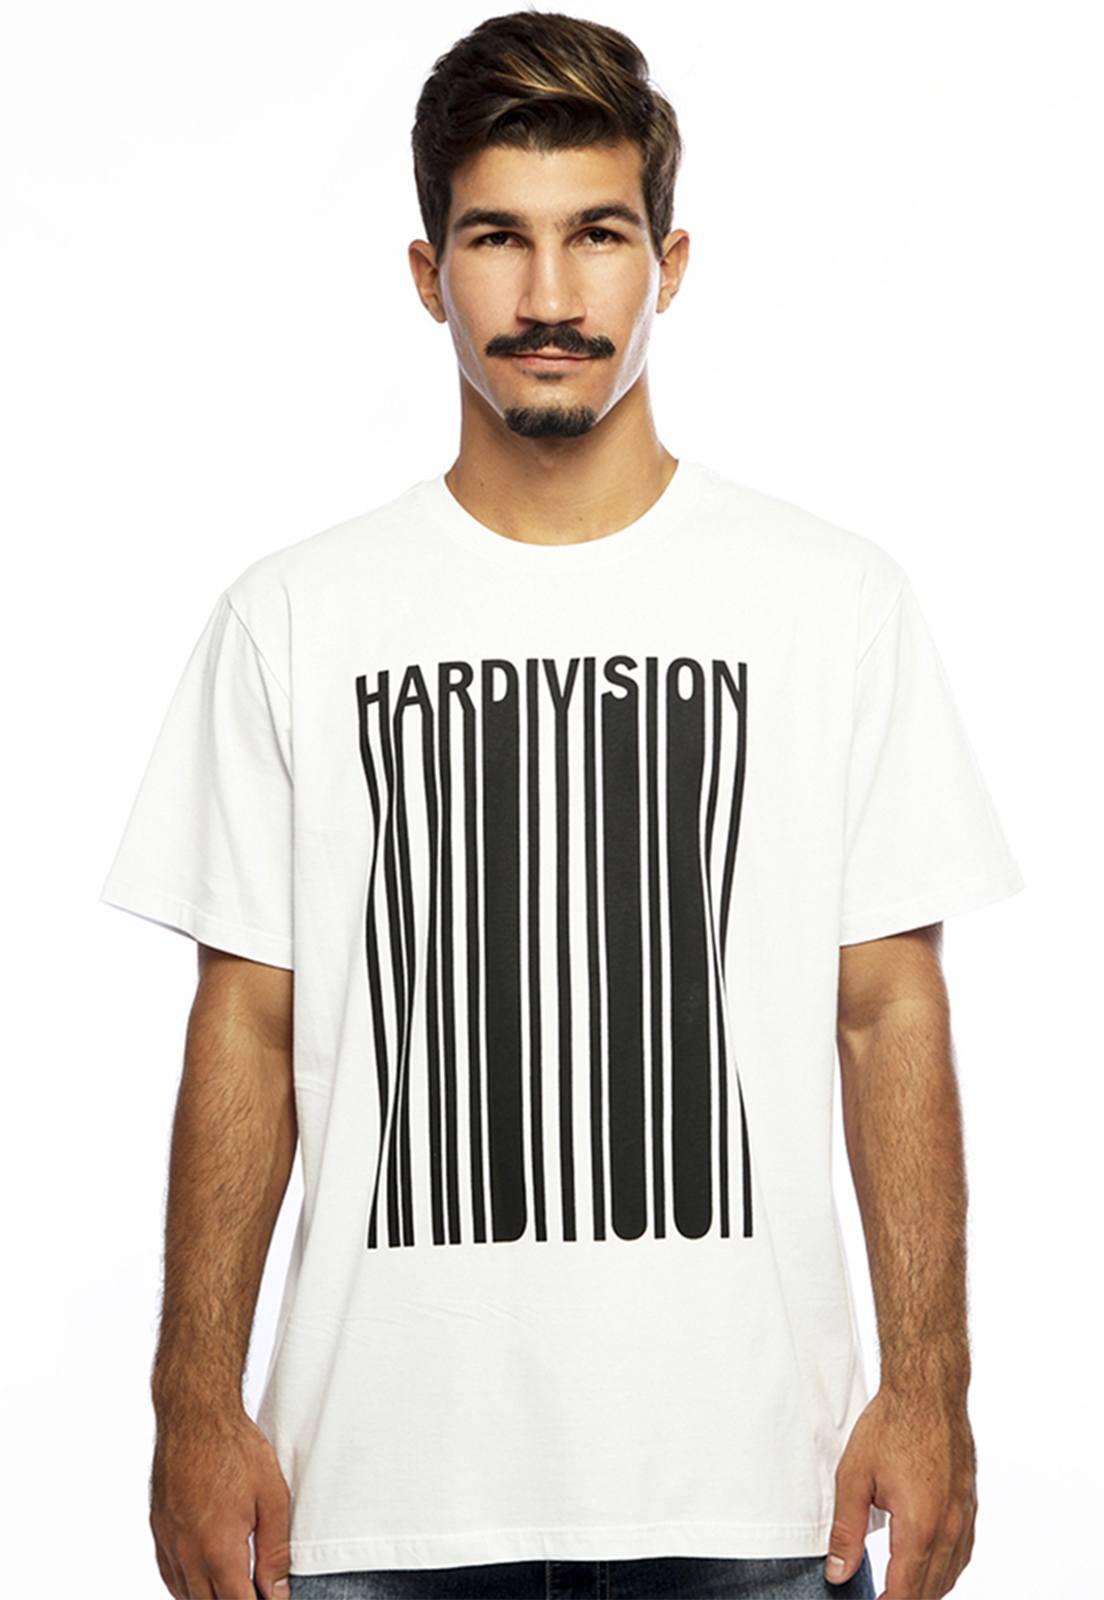 Camiseta masculina branca New Order - 100% algodão - Hardivision